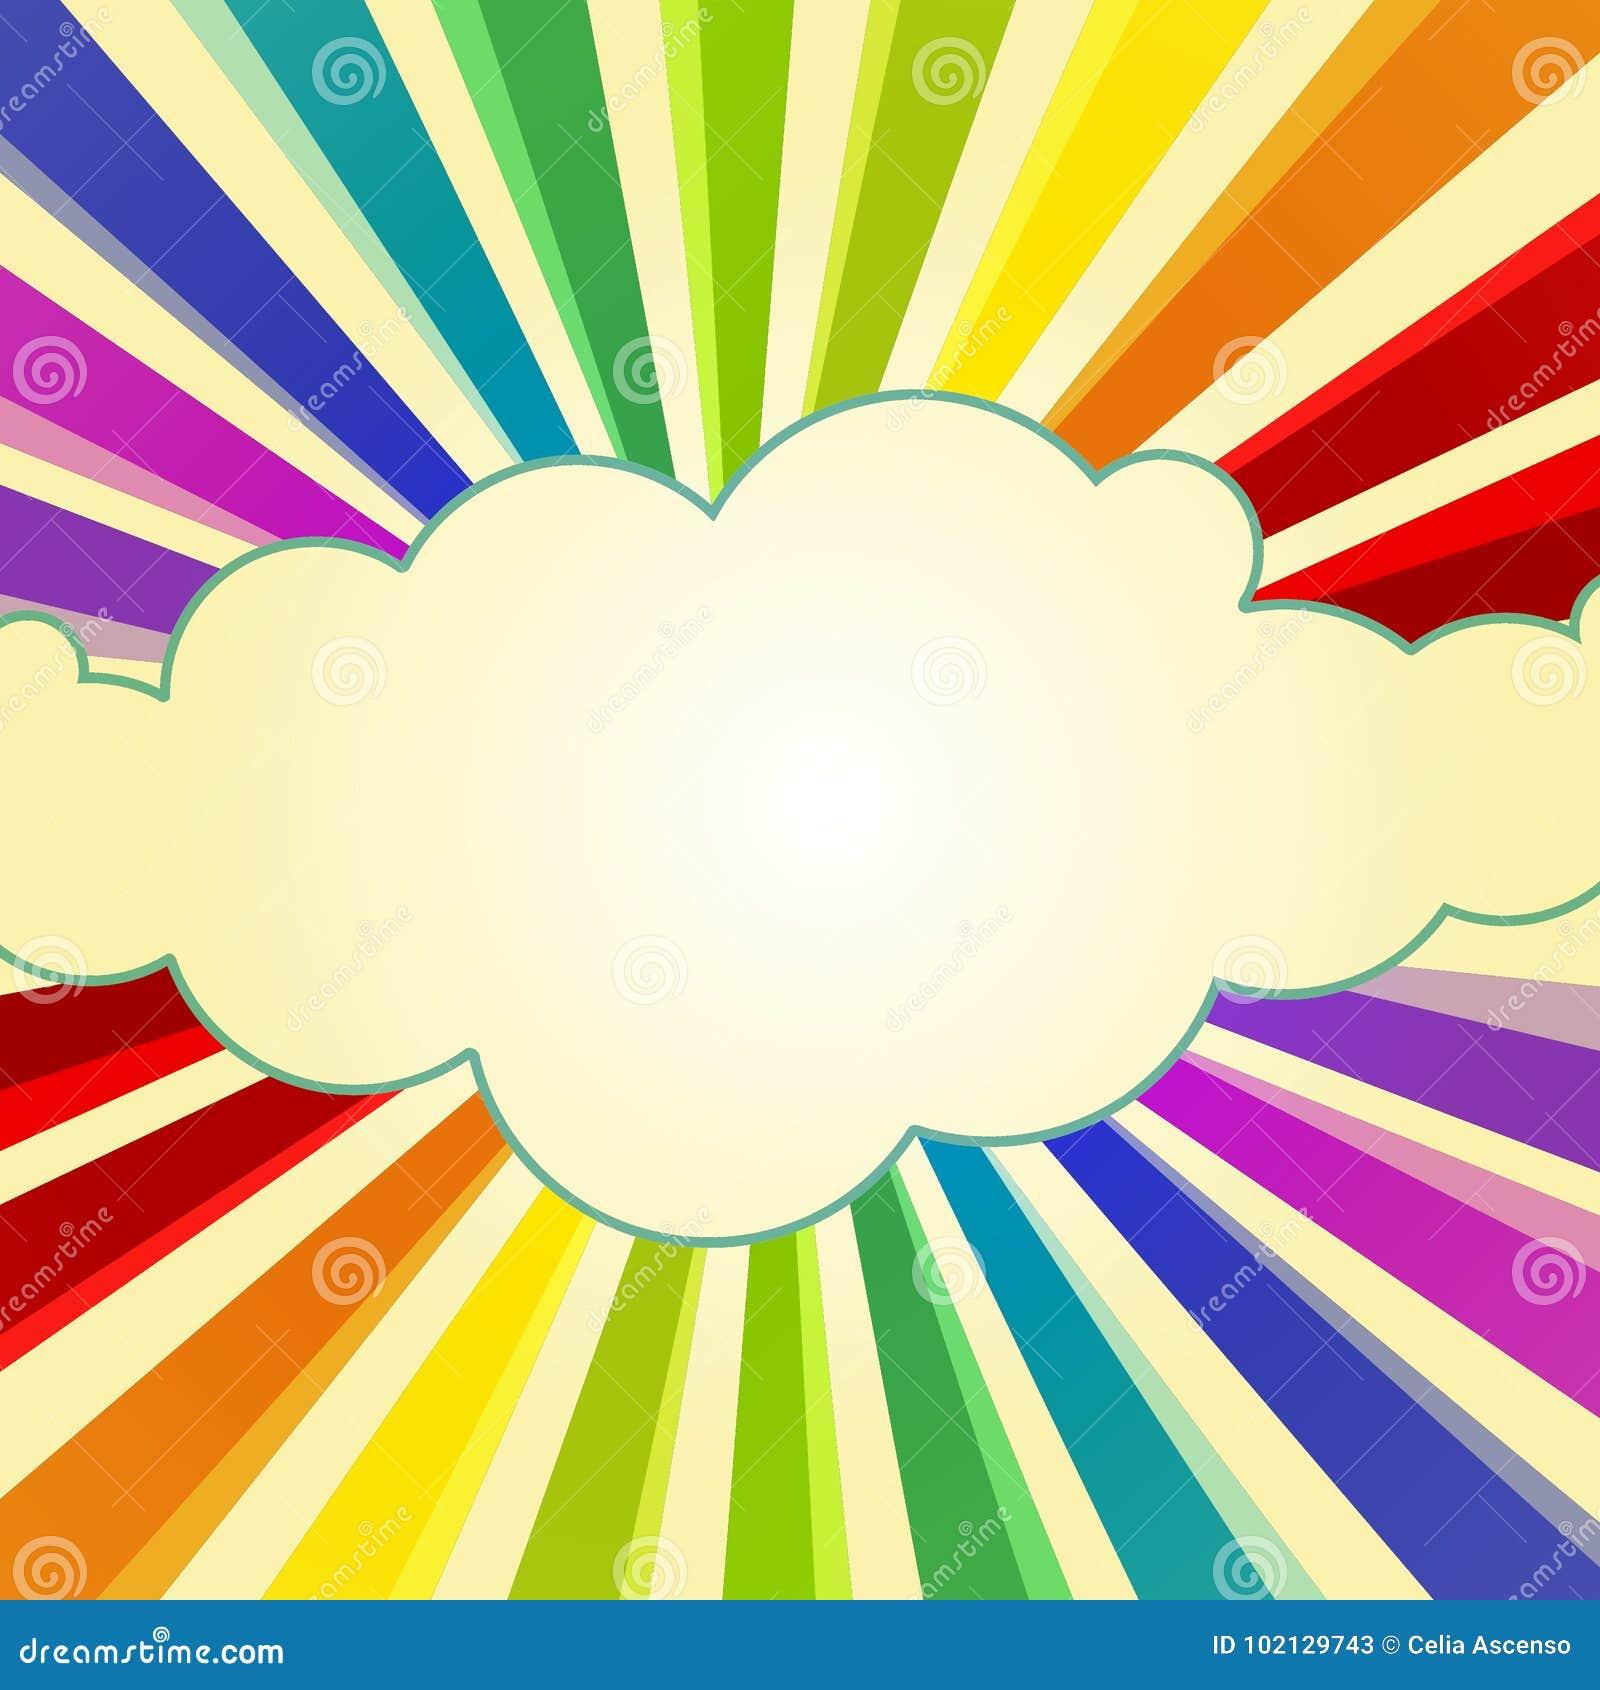 Rainbow Rays around a Cloud